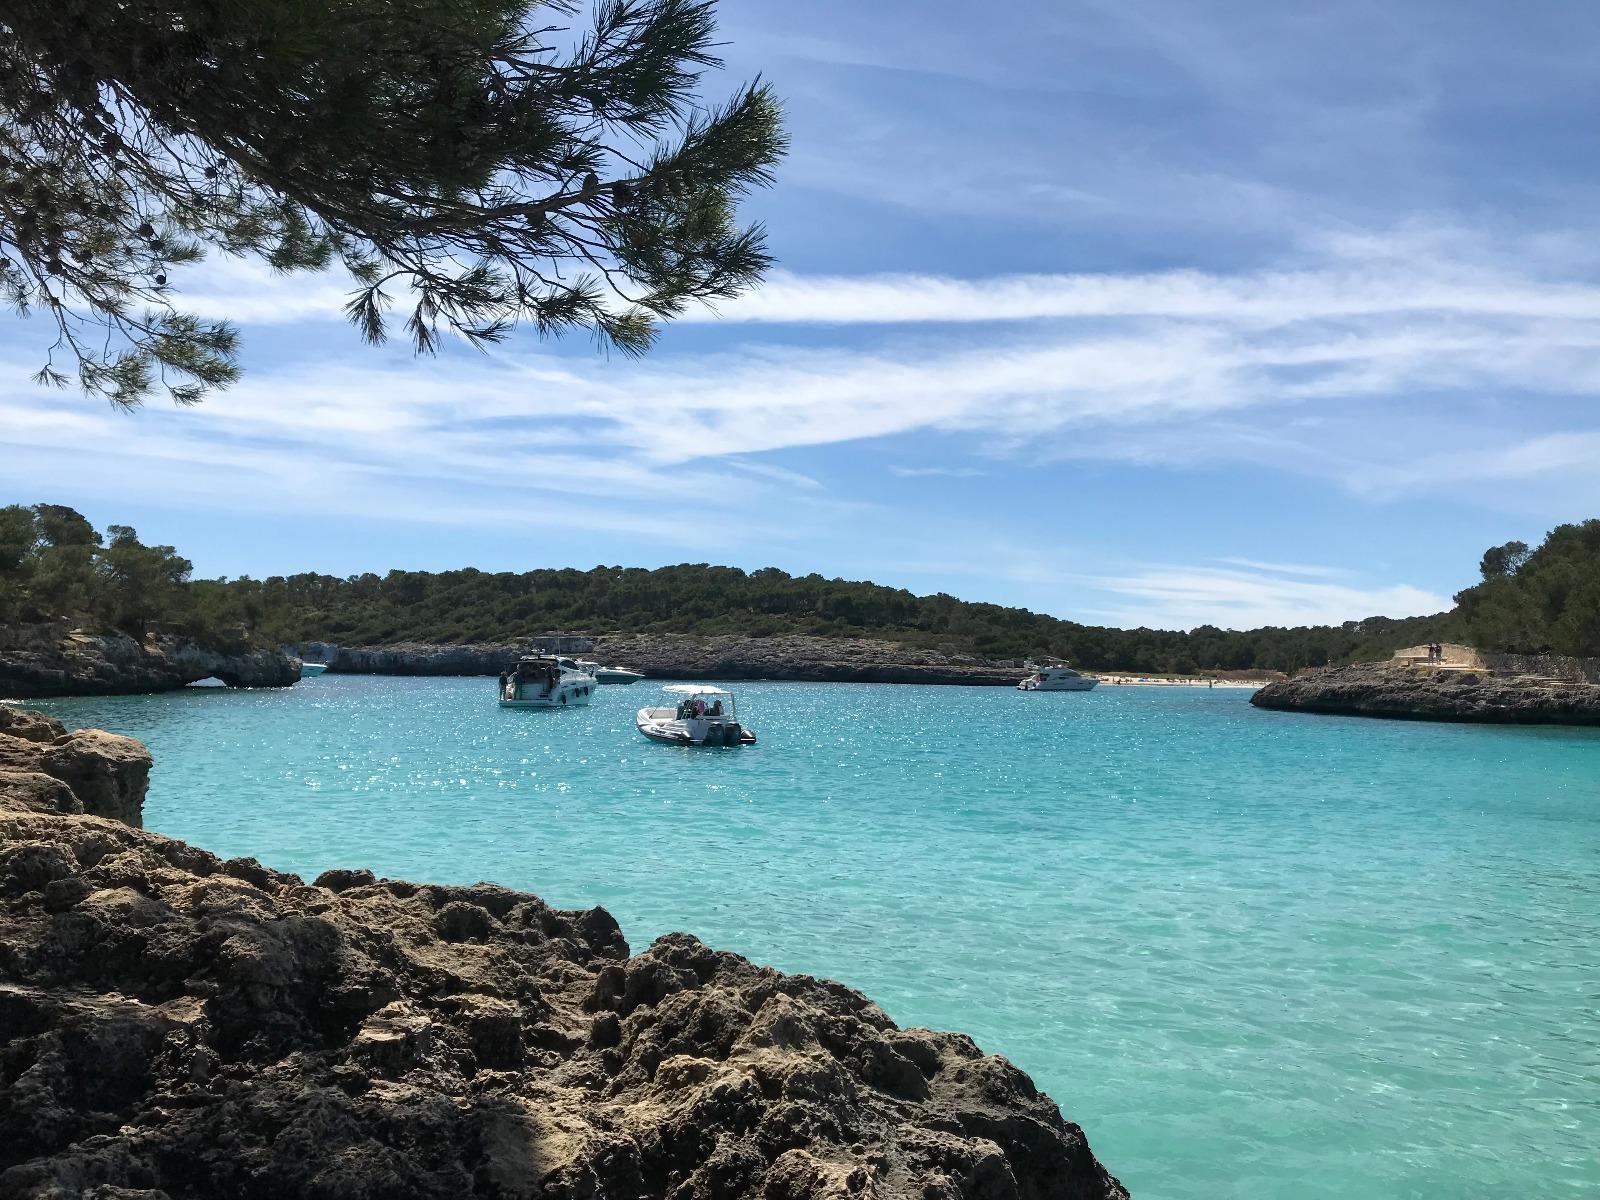 palma-mallorca-bonnes-adresses-playa-samarador-bateau